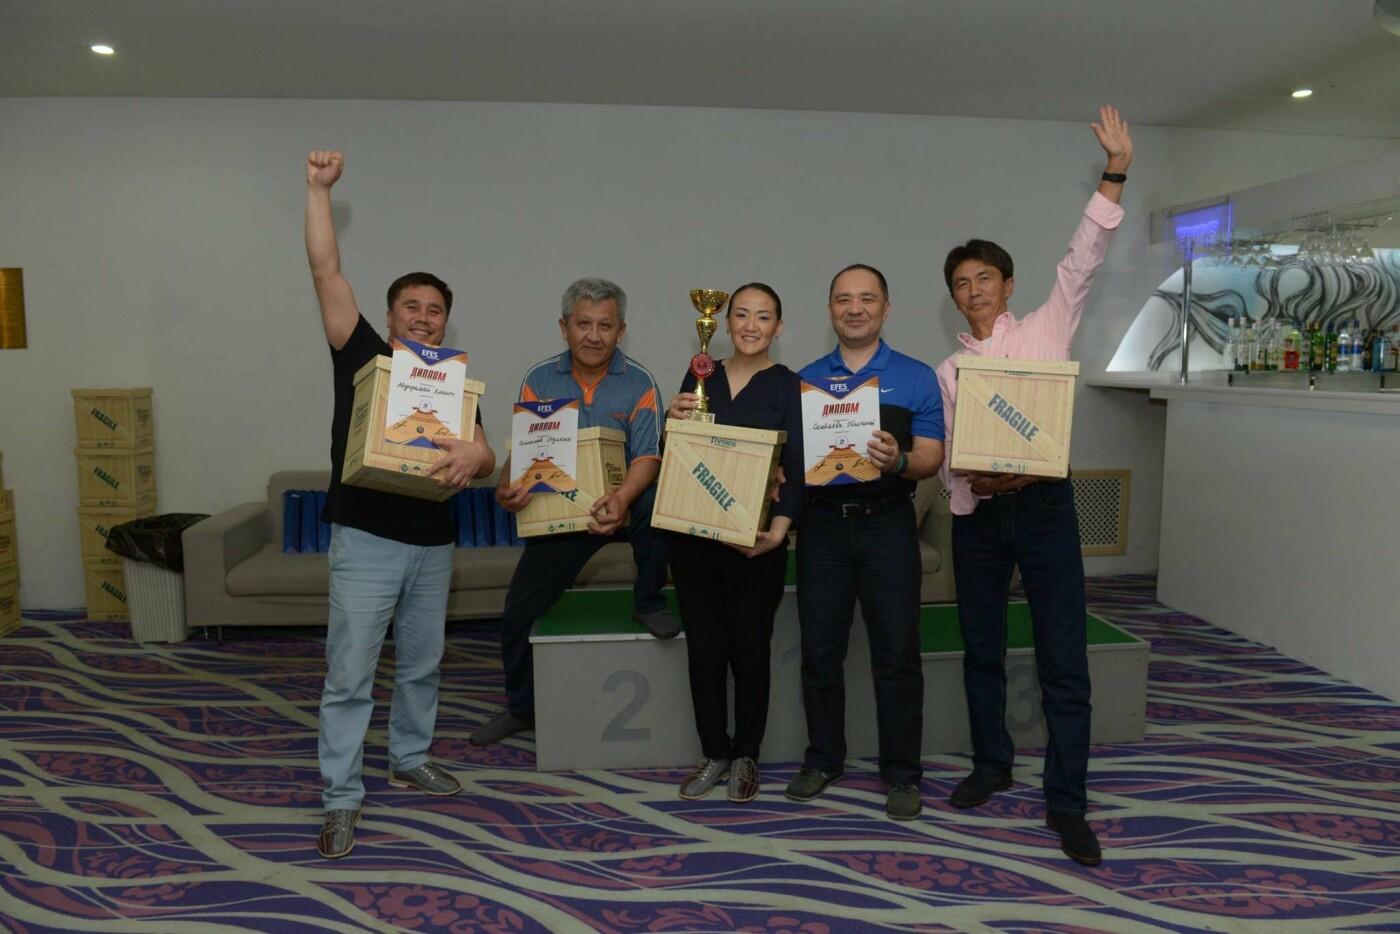 II турнир по боулингу среди журналистов прошел в Алматы (ФОТО), фото-21